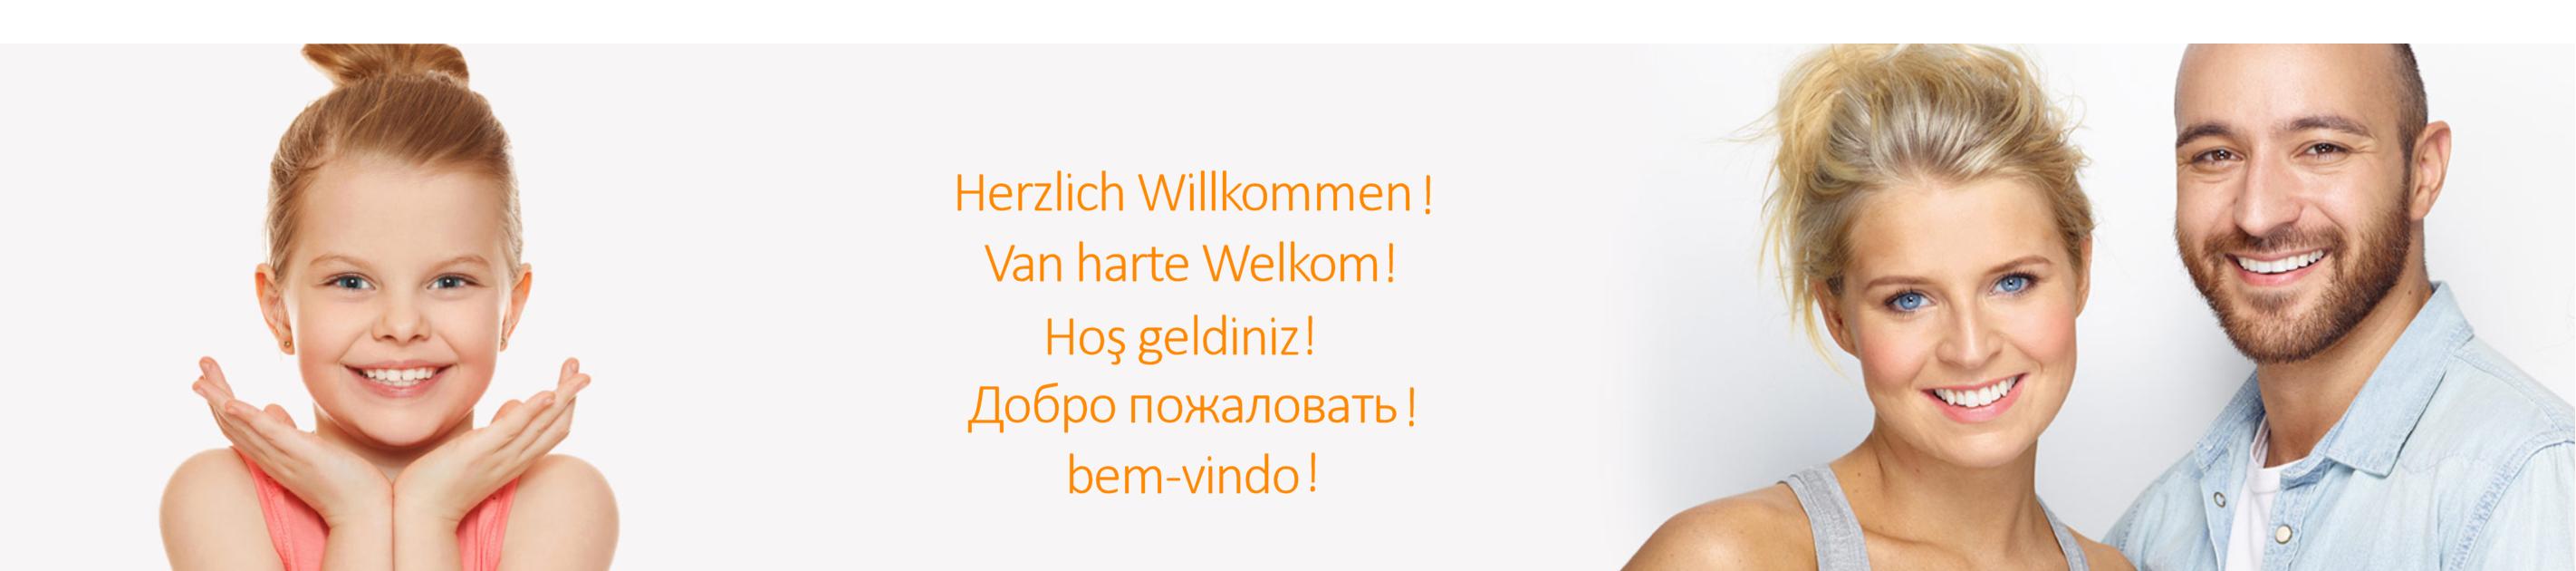 Banner mit Willkommen Kieferorthopäde Rene Müller Stadtlohn H